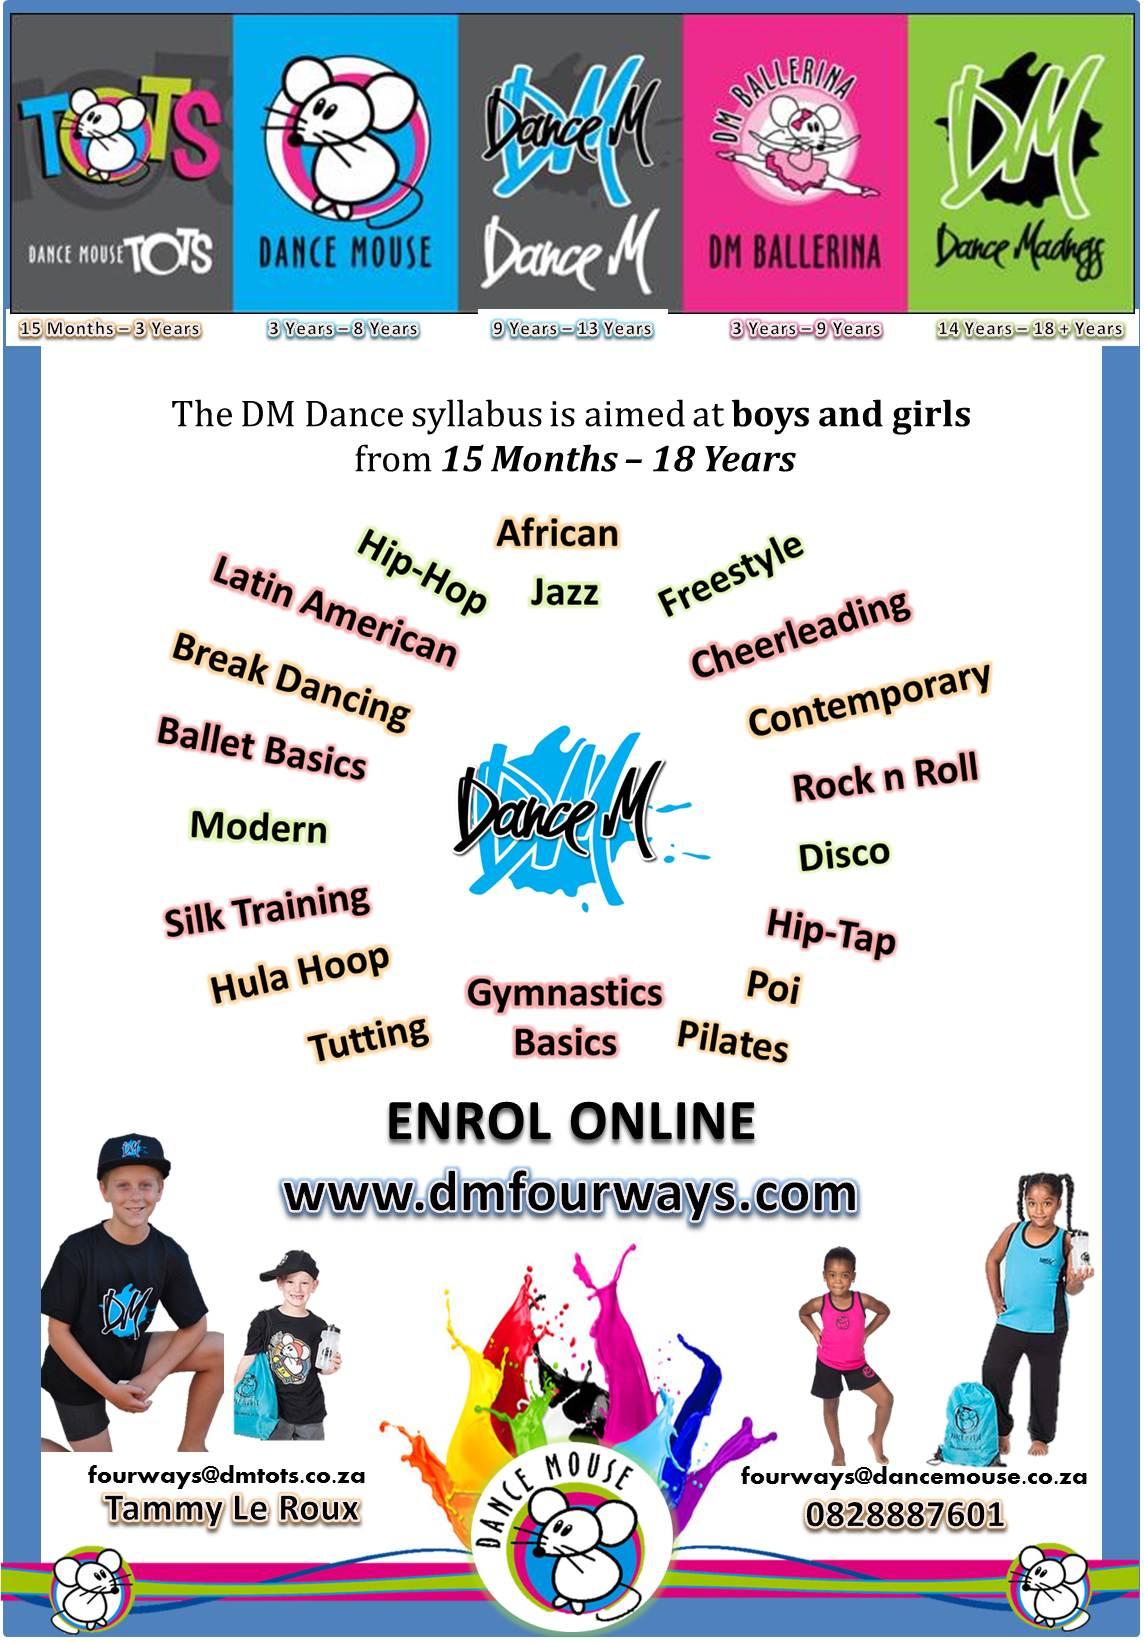 Dance Mouse Dance Info Page.jpg